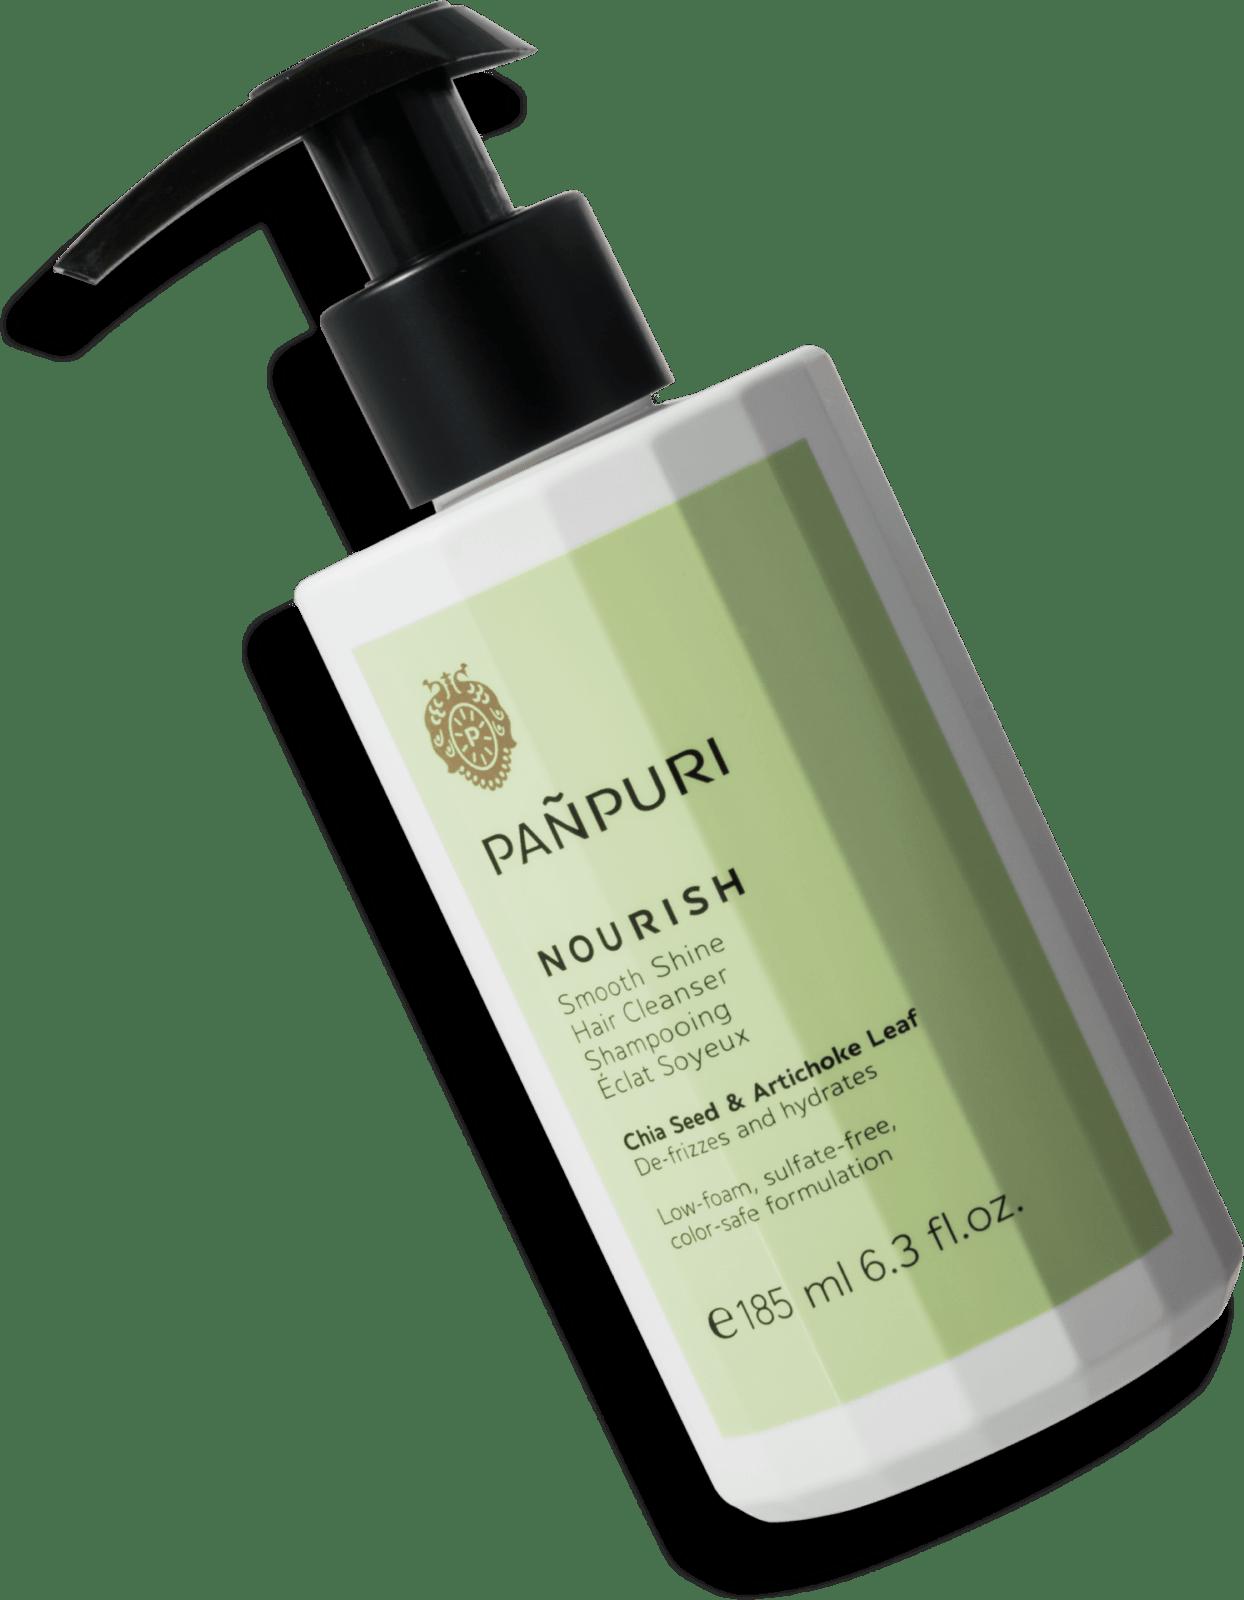 Nourish Smooth Shine Hair Cleanser